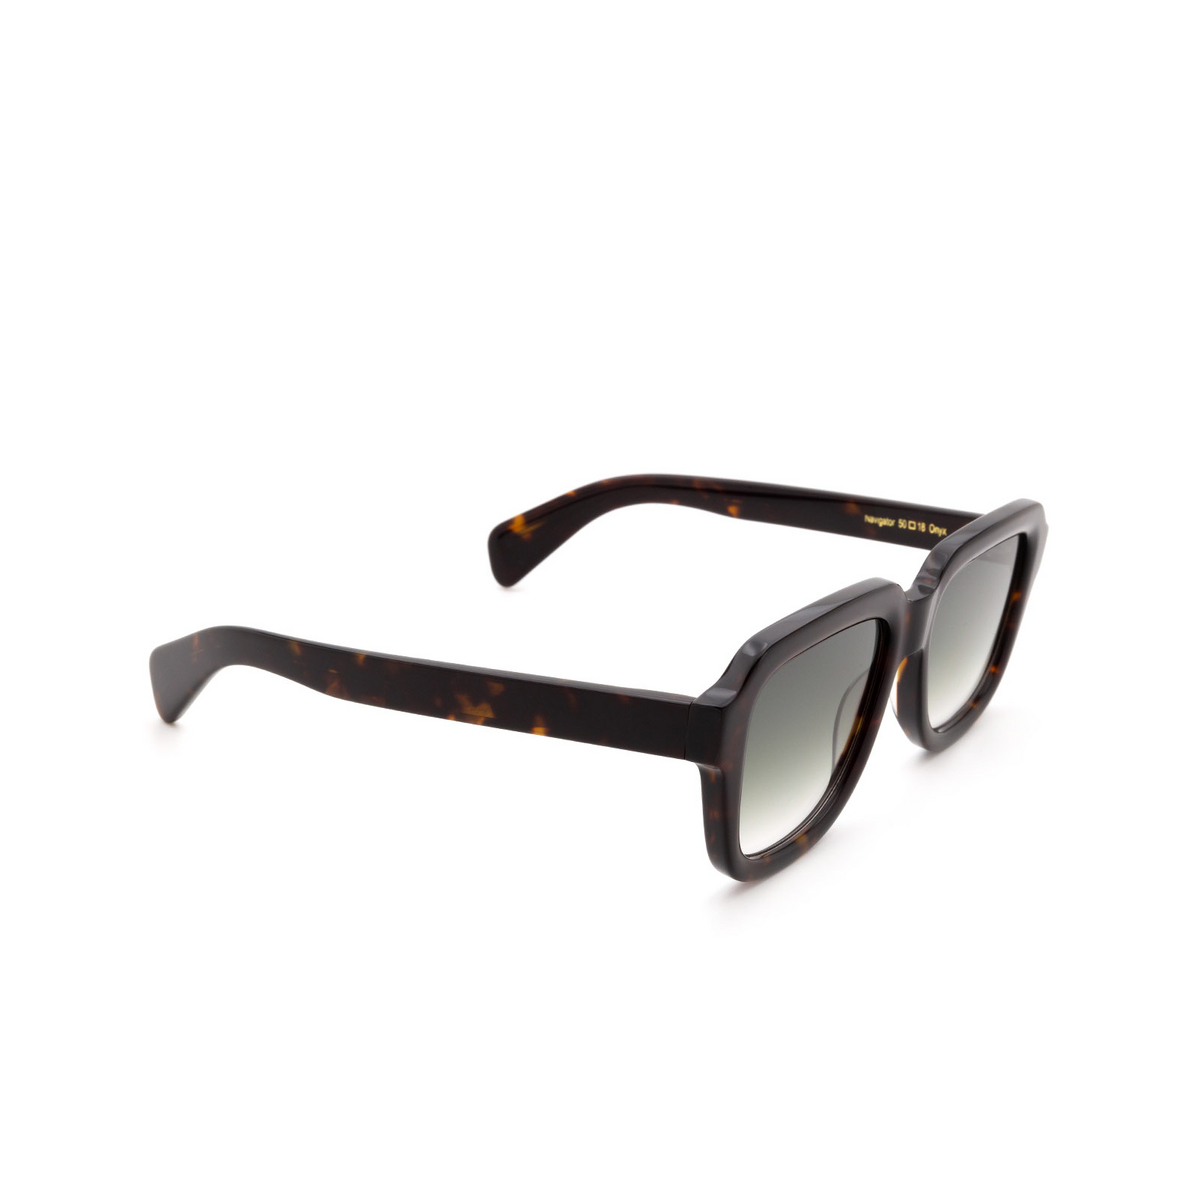 Chimi® Square Sunglasses: Voyage Navigator color Onyx - three-quarters view.